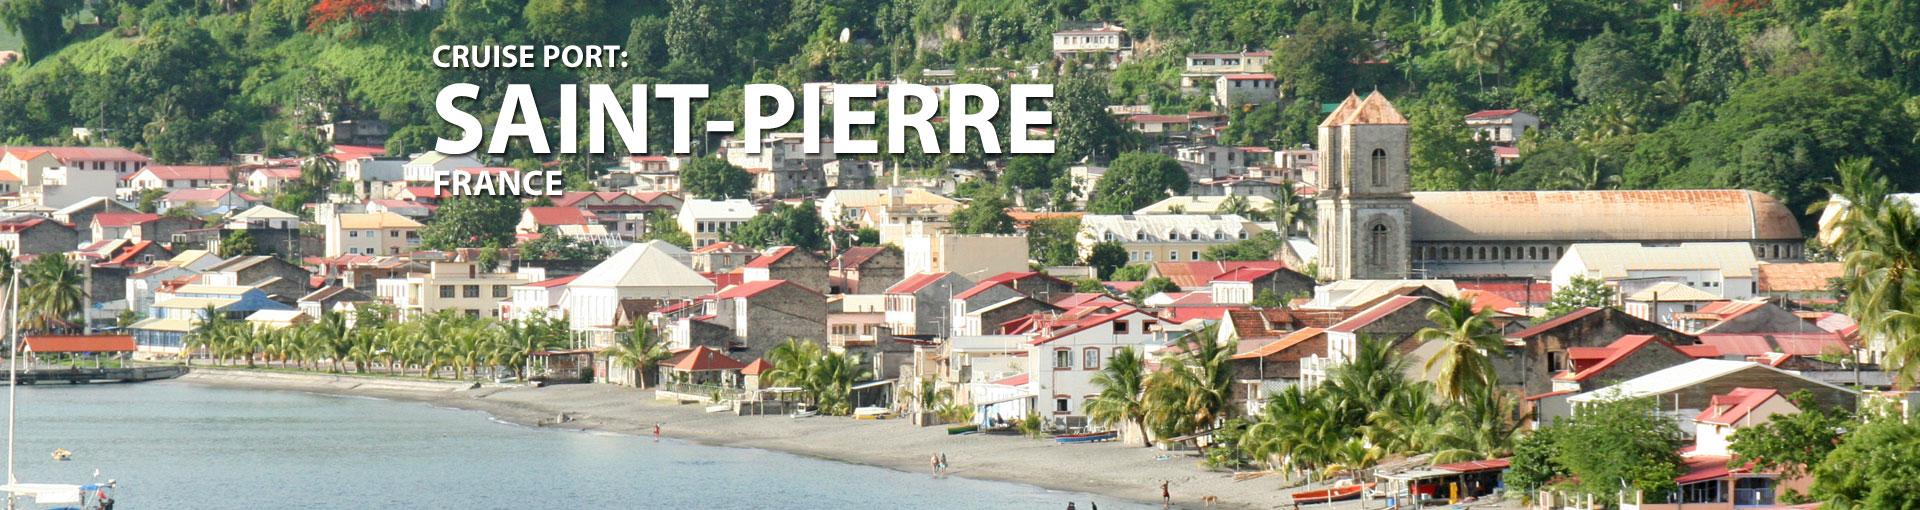 Cruises to Saint-Pierre, France